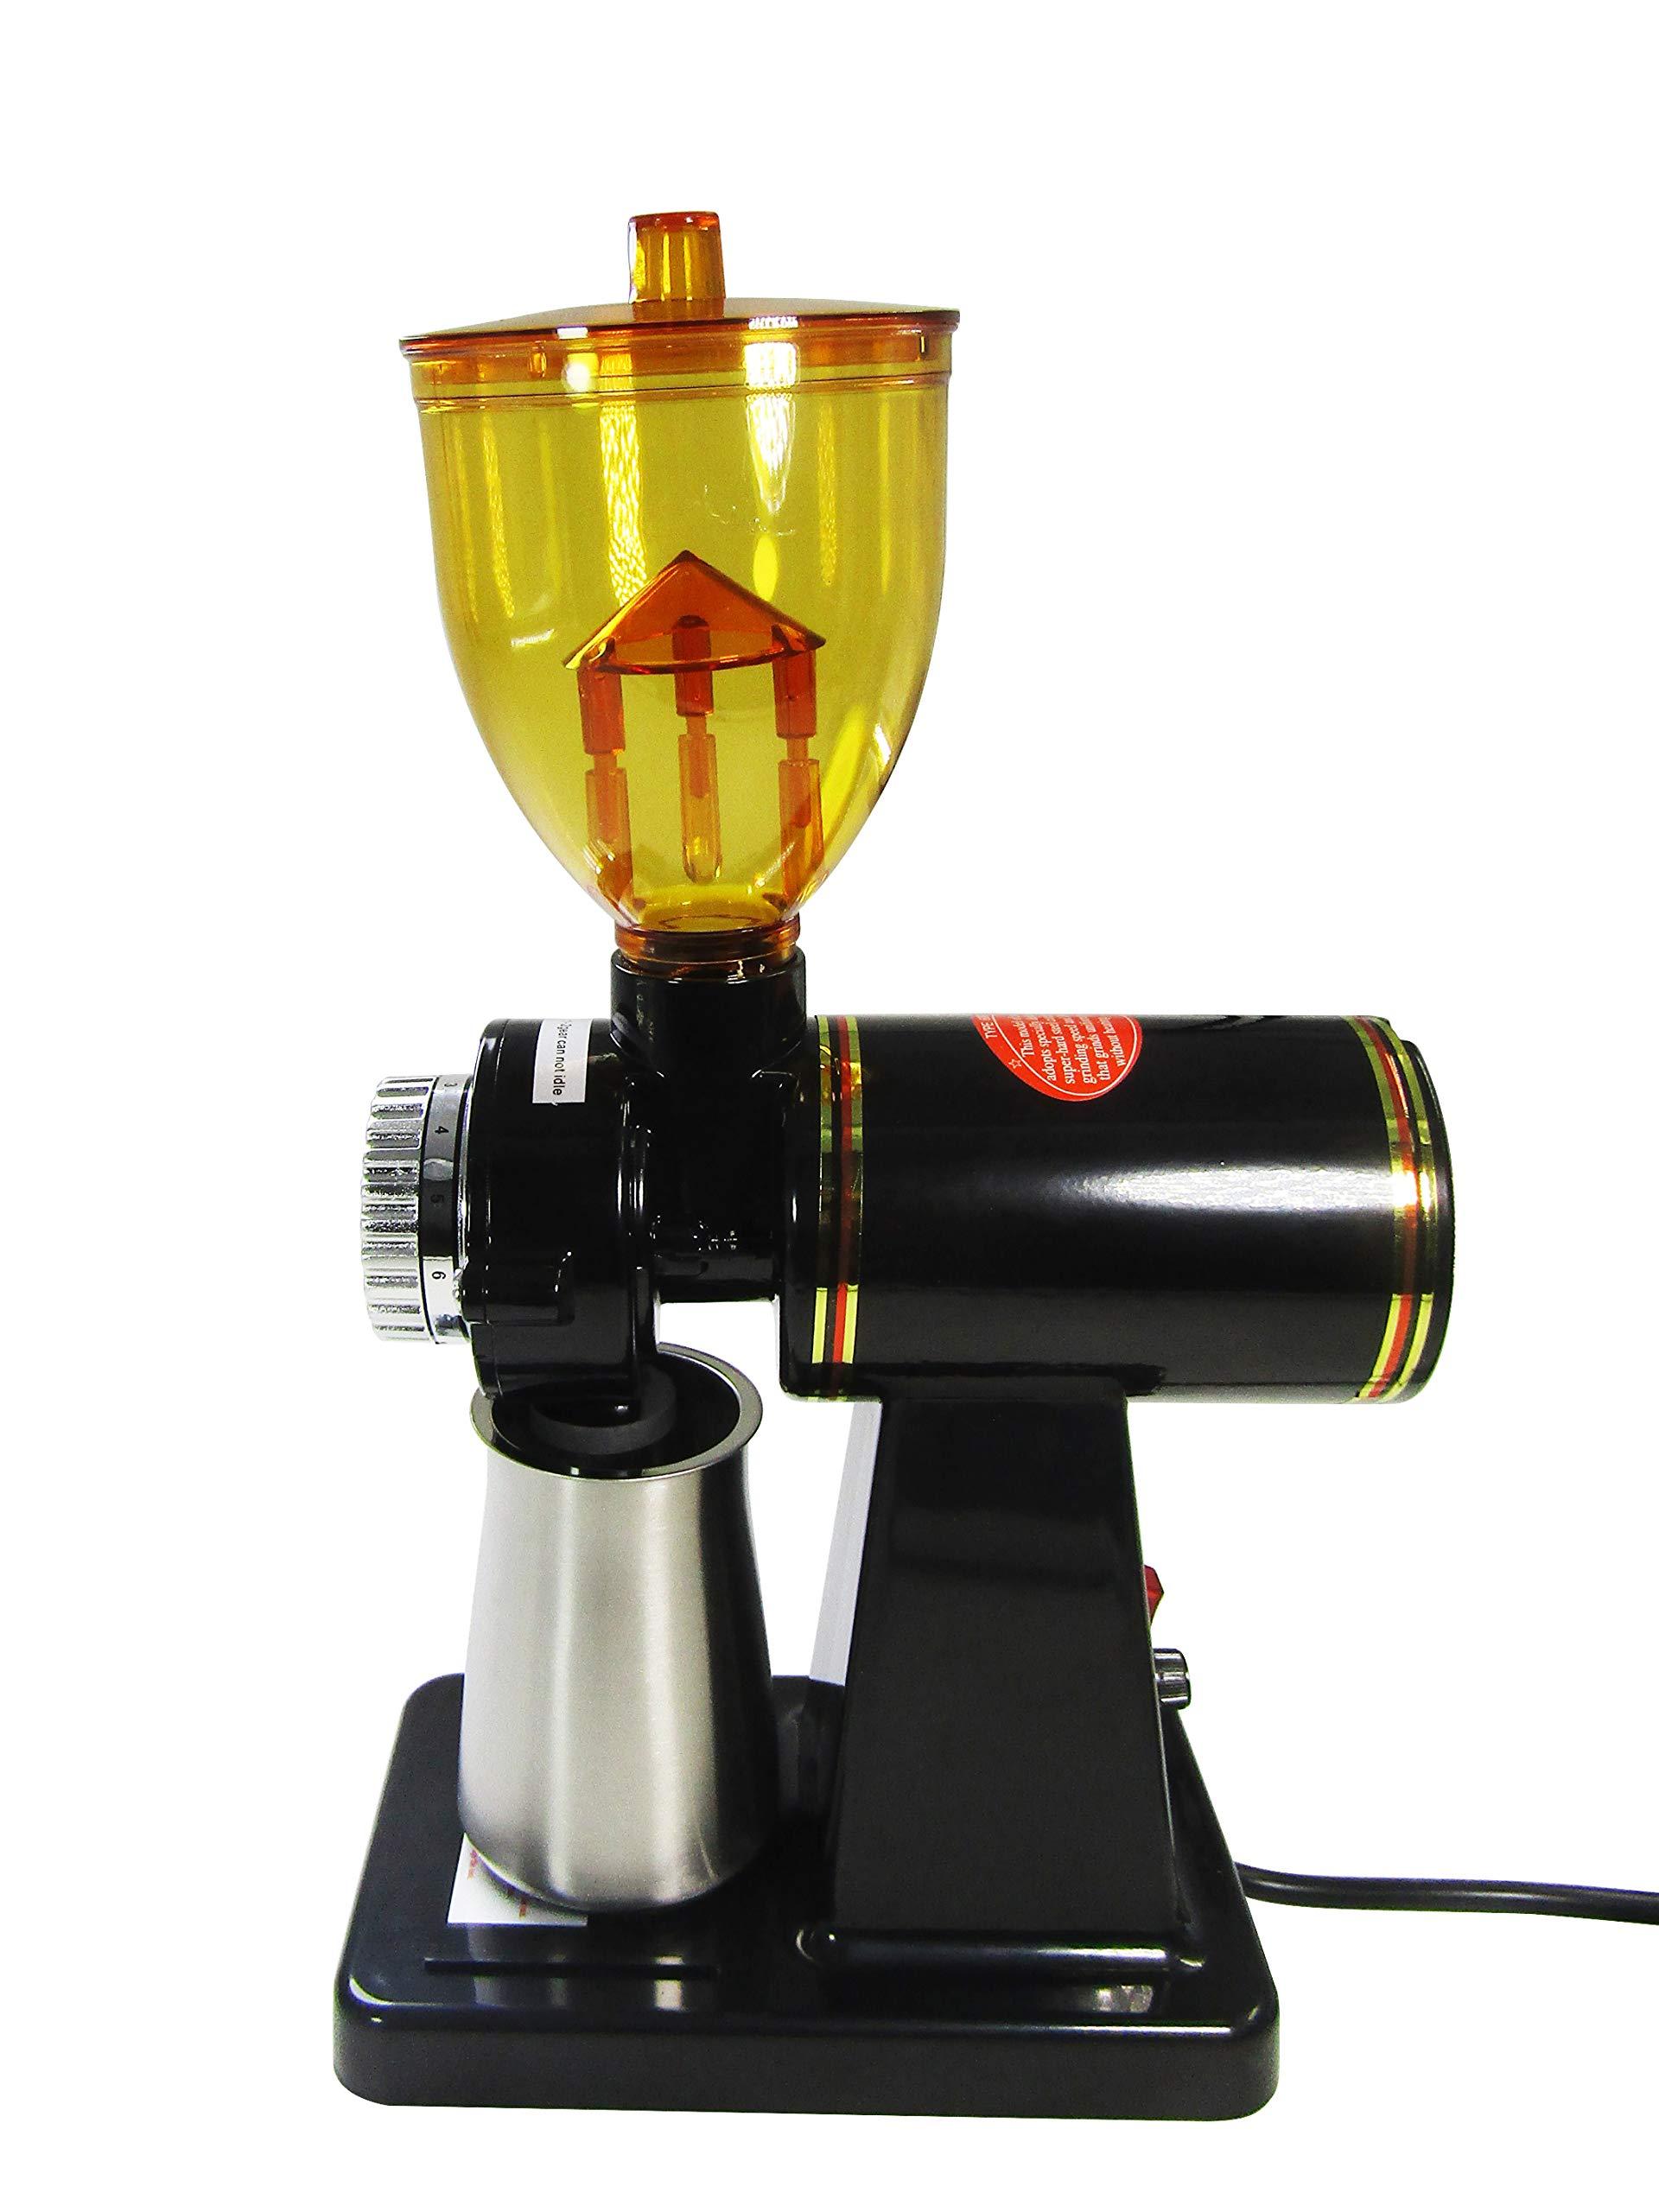 JIAWANSHUN 250g Automatic Coffee Burr Grinder Coffee Burr Mill Coffee Bean Grinder (110V, Black)